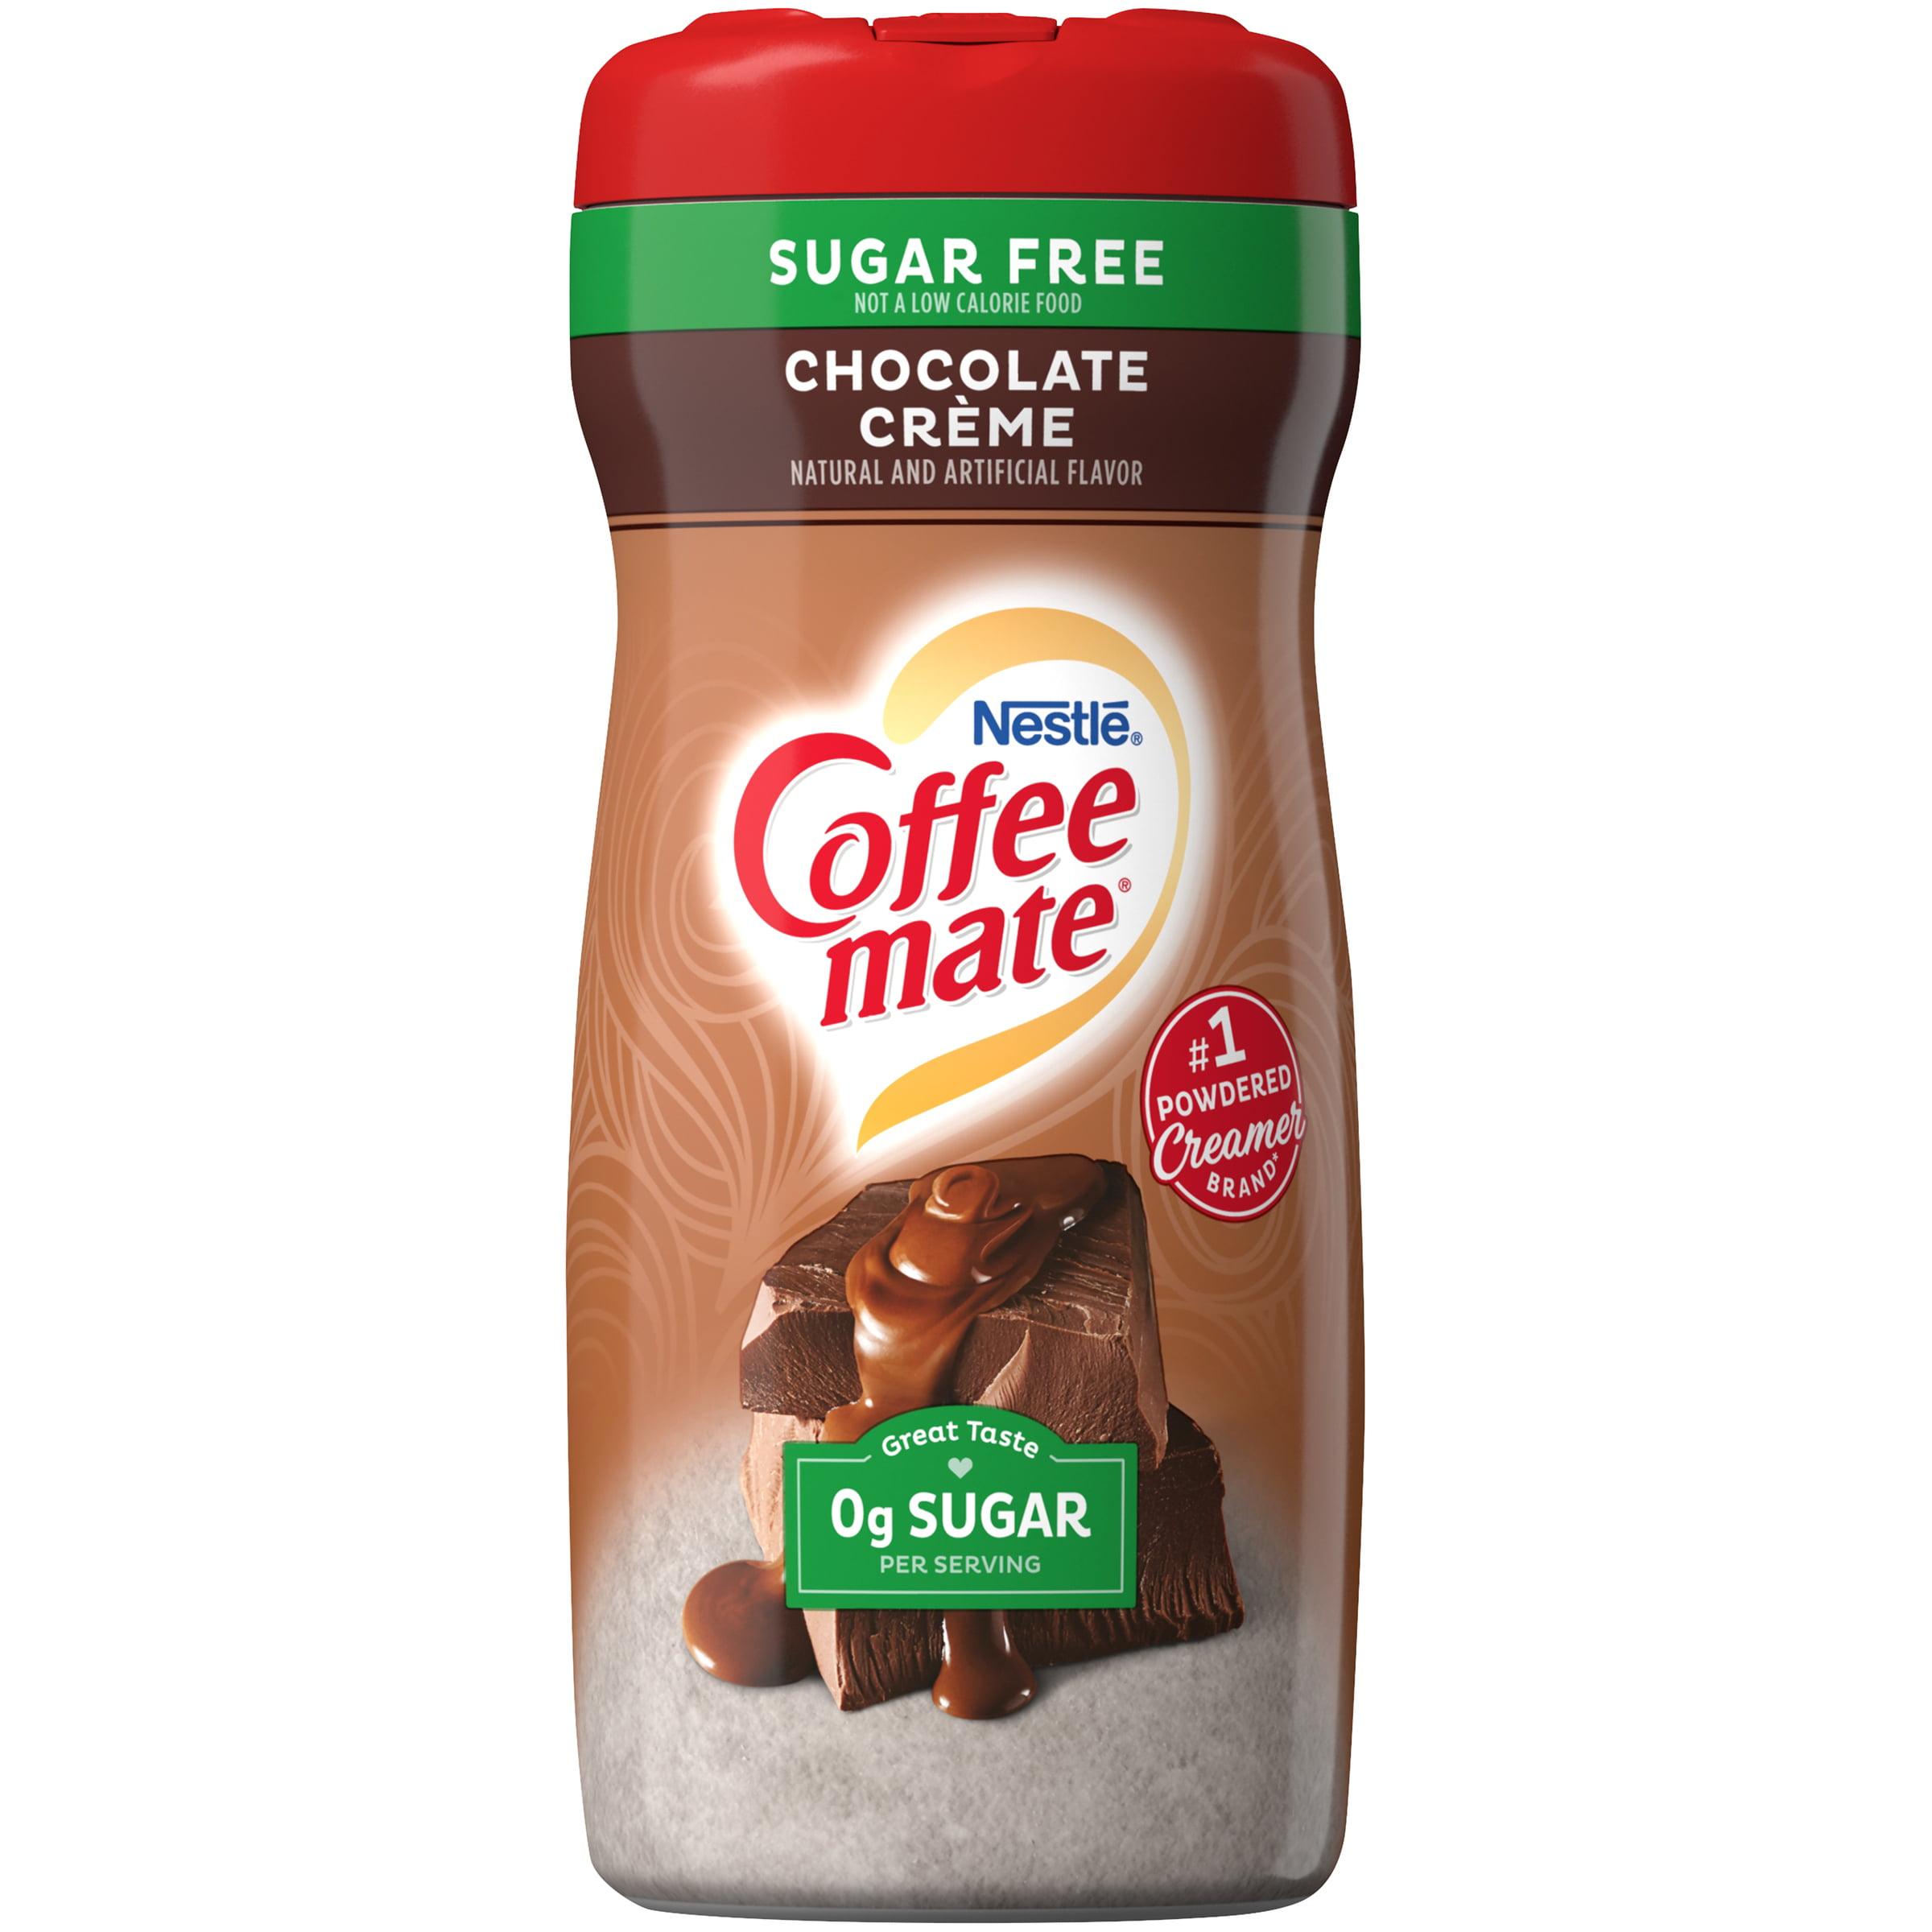 COFFEE MATE Sugar Free Chocolate Crème Powder Coffee Creamer 10.2 Oz. Canister   Non-dairy ...